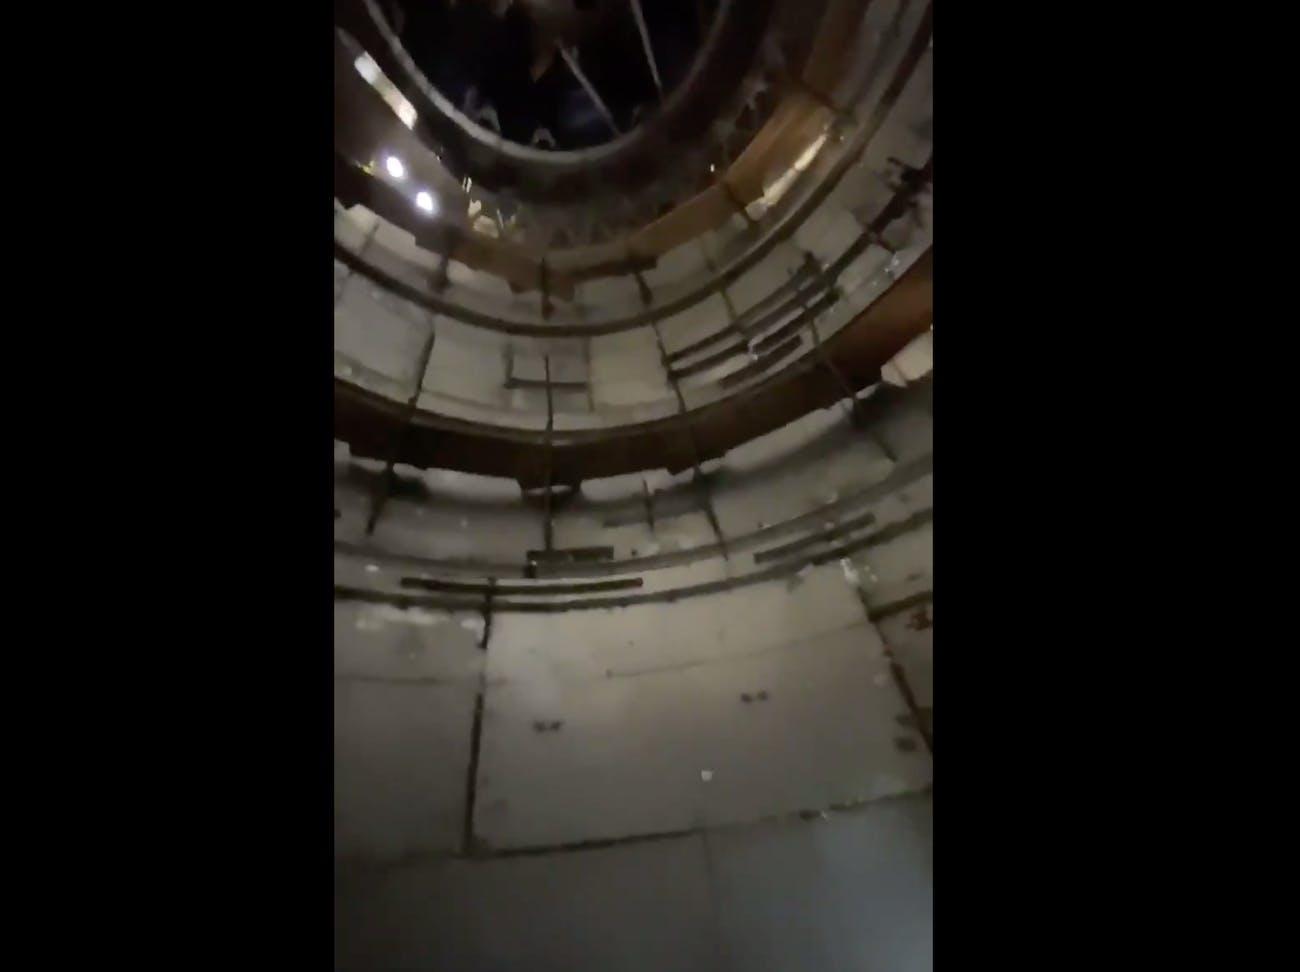 The bare interior of the Starship vessel.